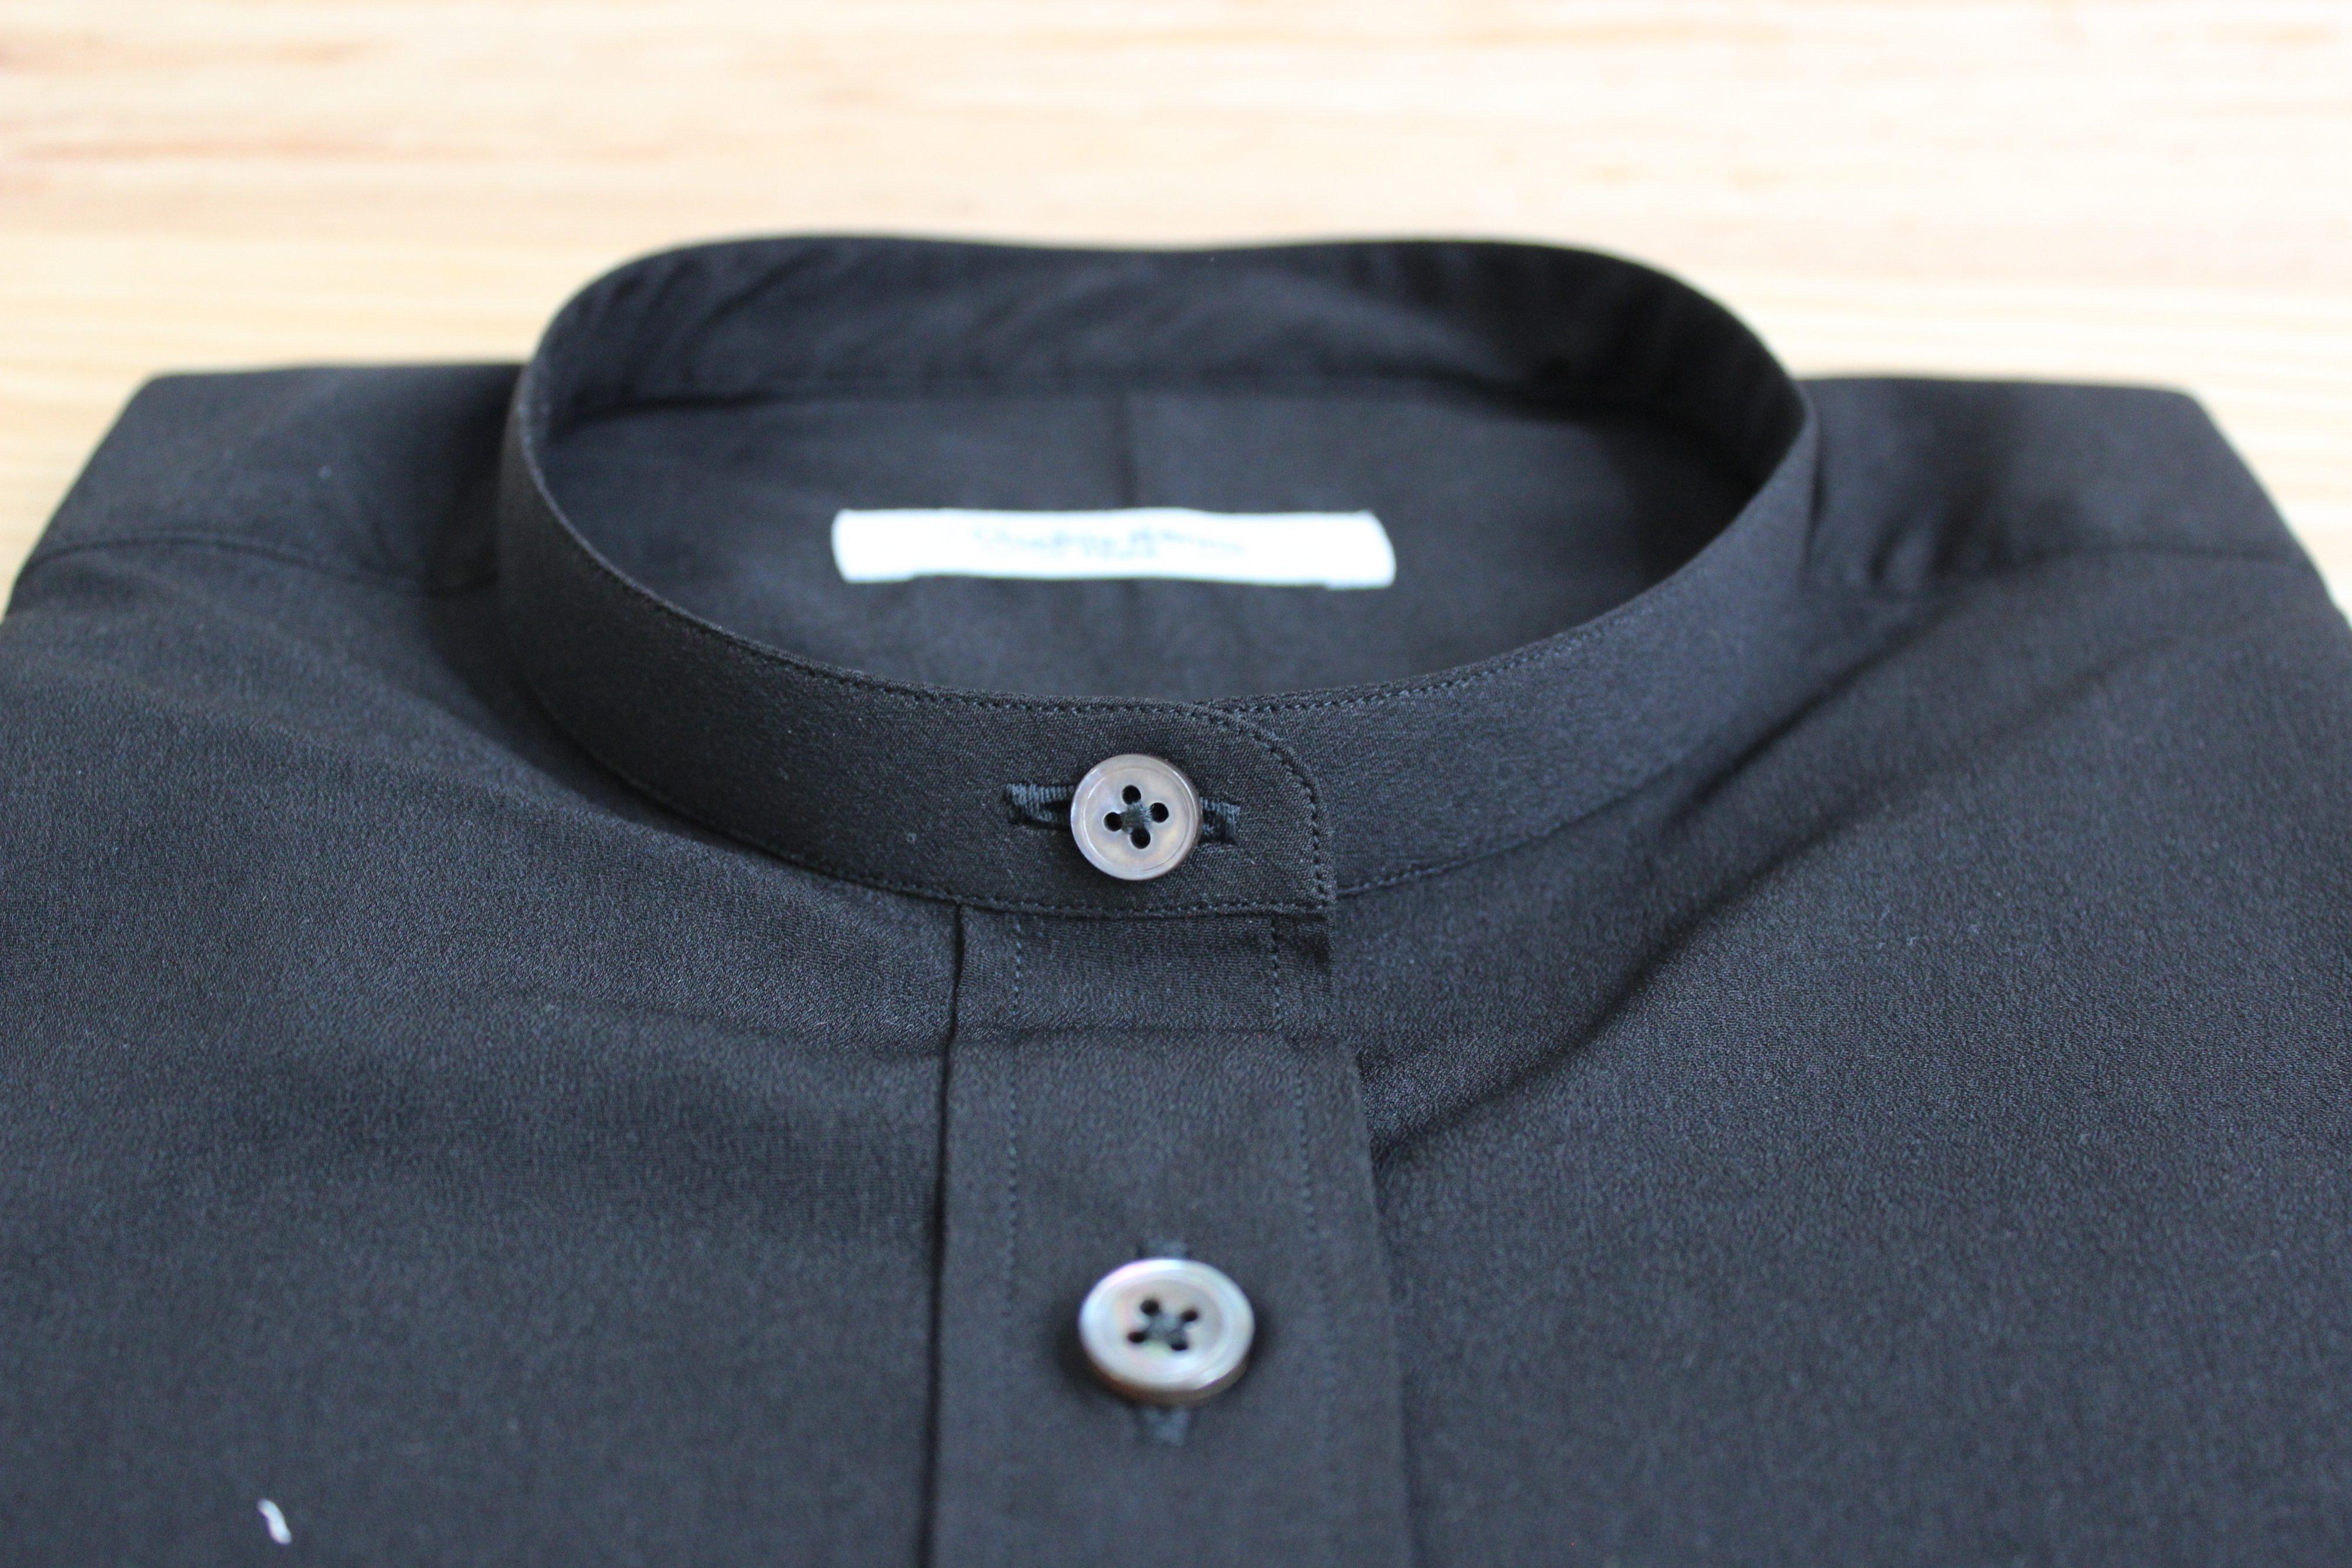 chemises voile suisse sur mesure , chemises voile suisse , chemises sur mesure